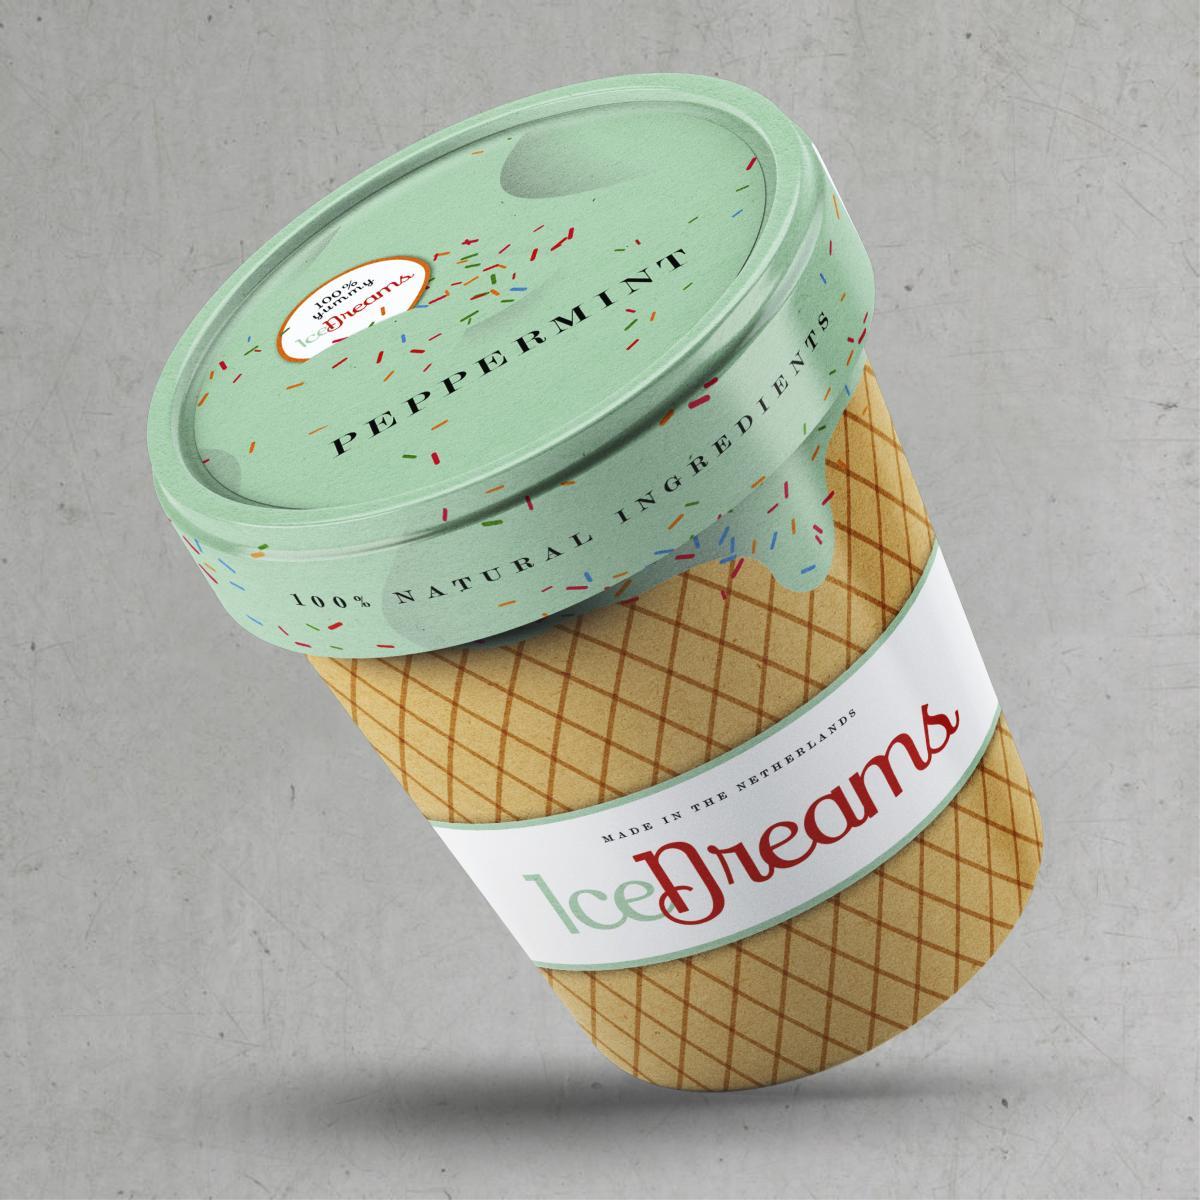 IceDreams →